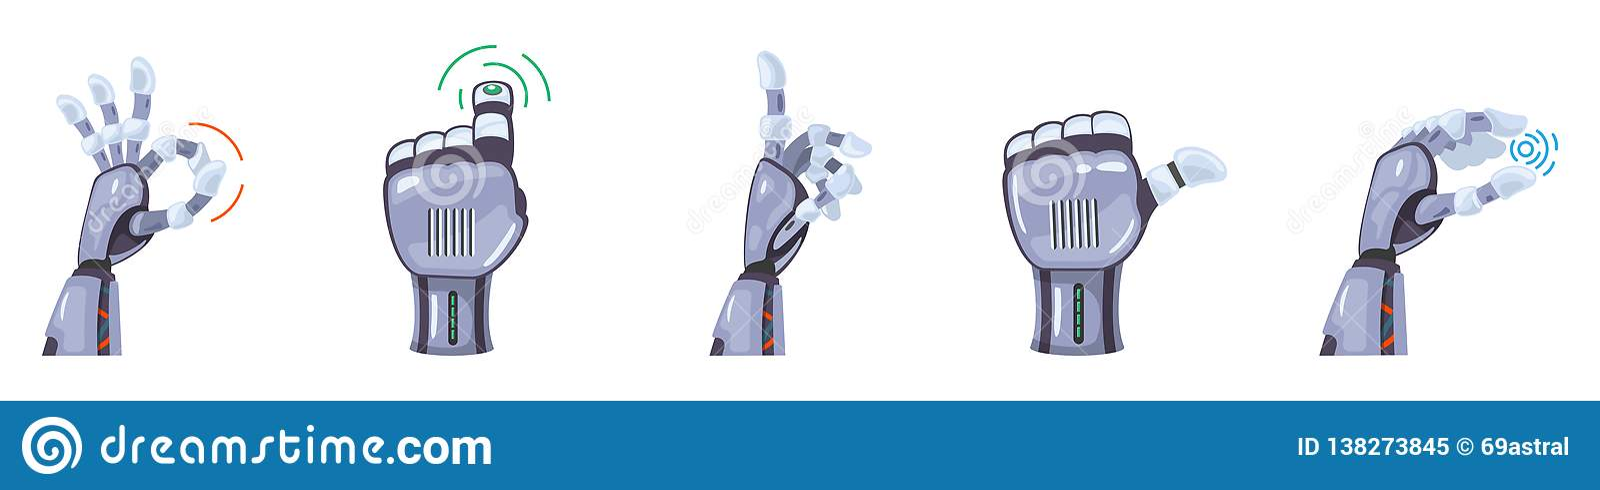 Robot hand gestures. Robotic hands. Mechanical technology machine engineering symbol Hand gestures set Futuristic design